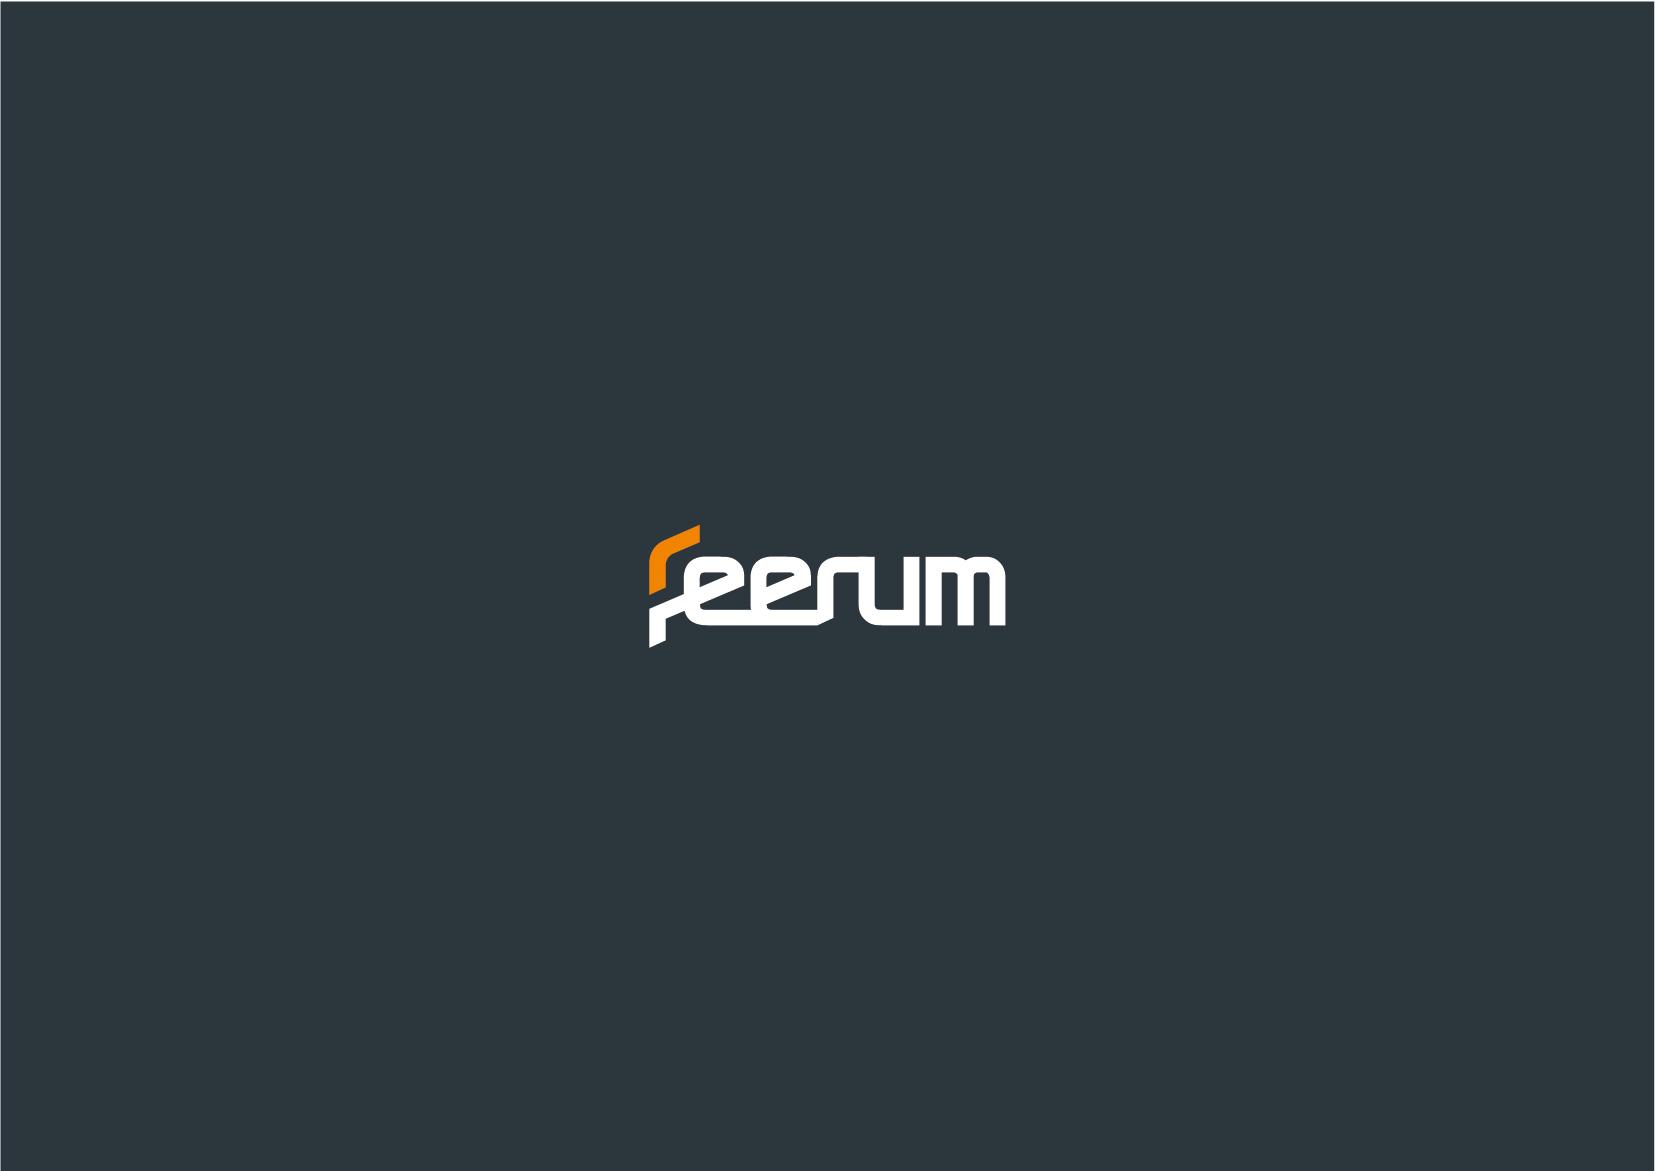 feerum nowe logo_dark